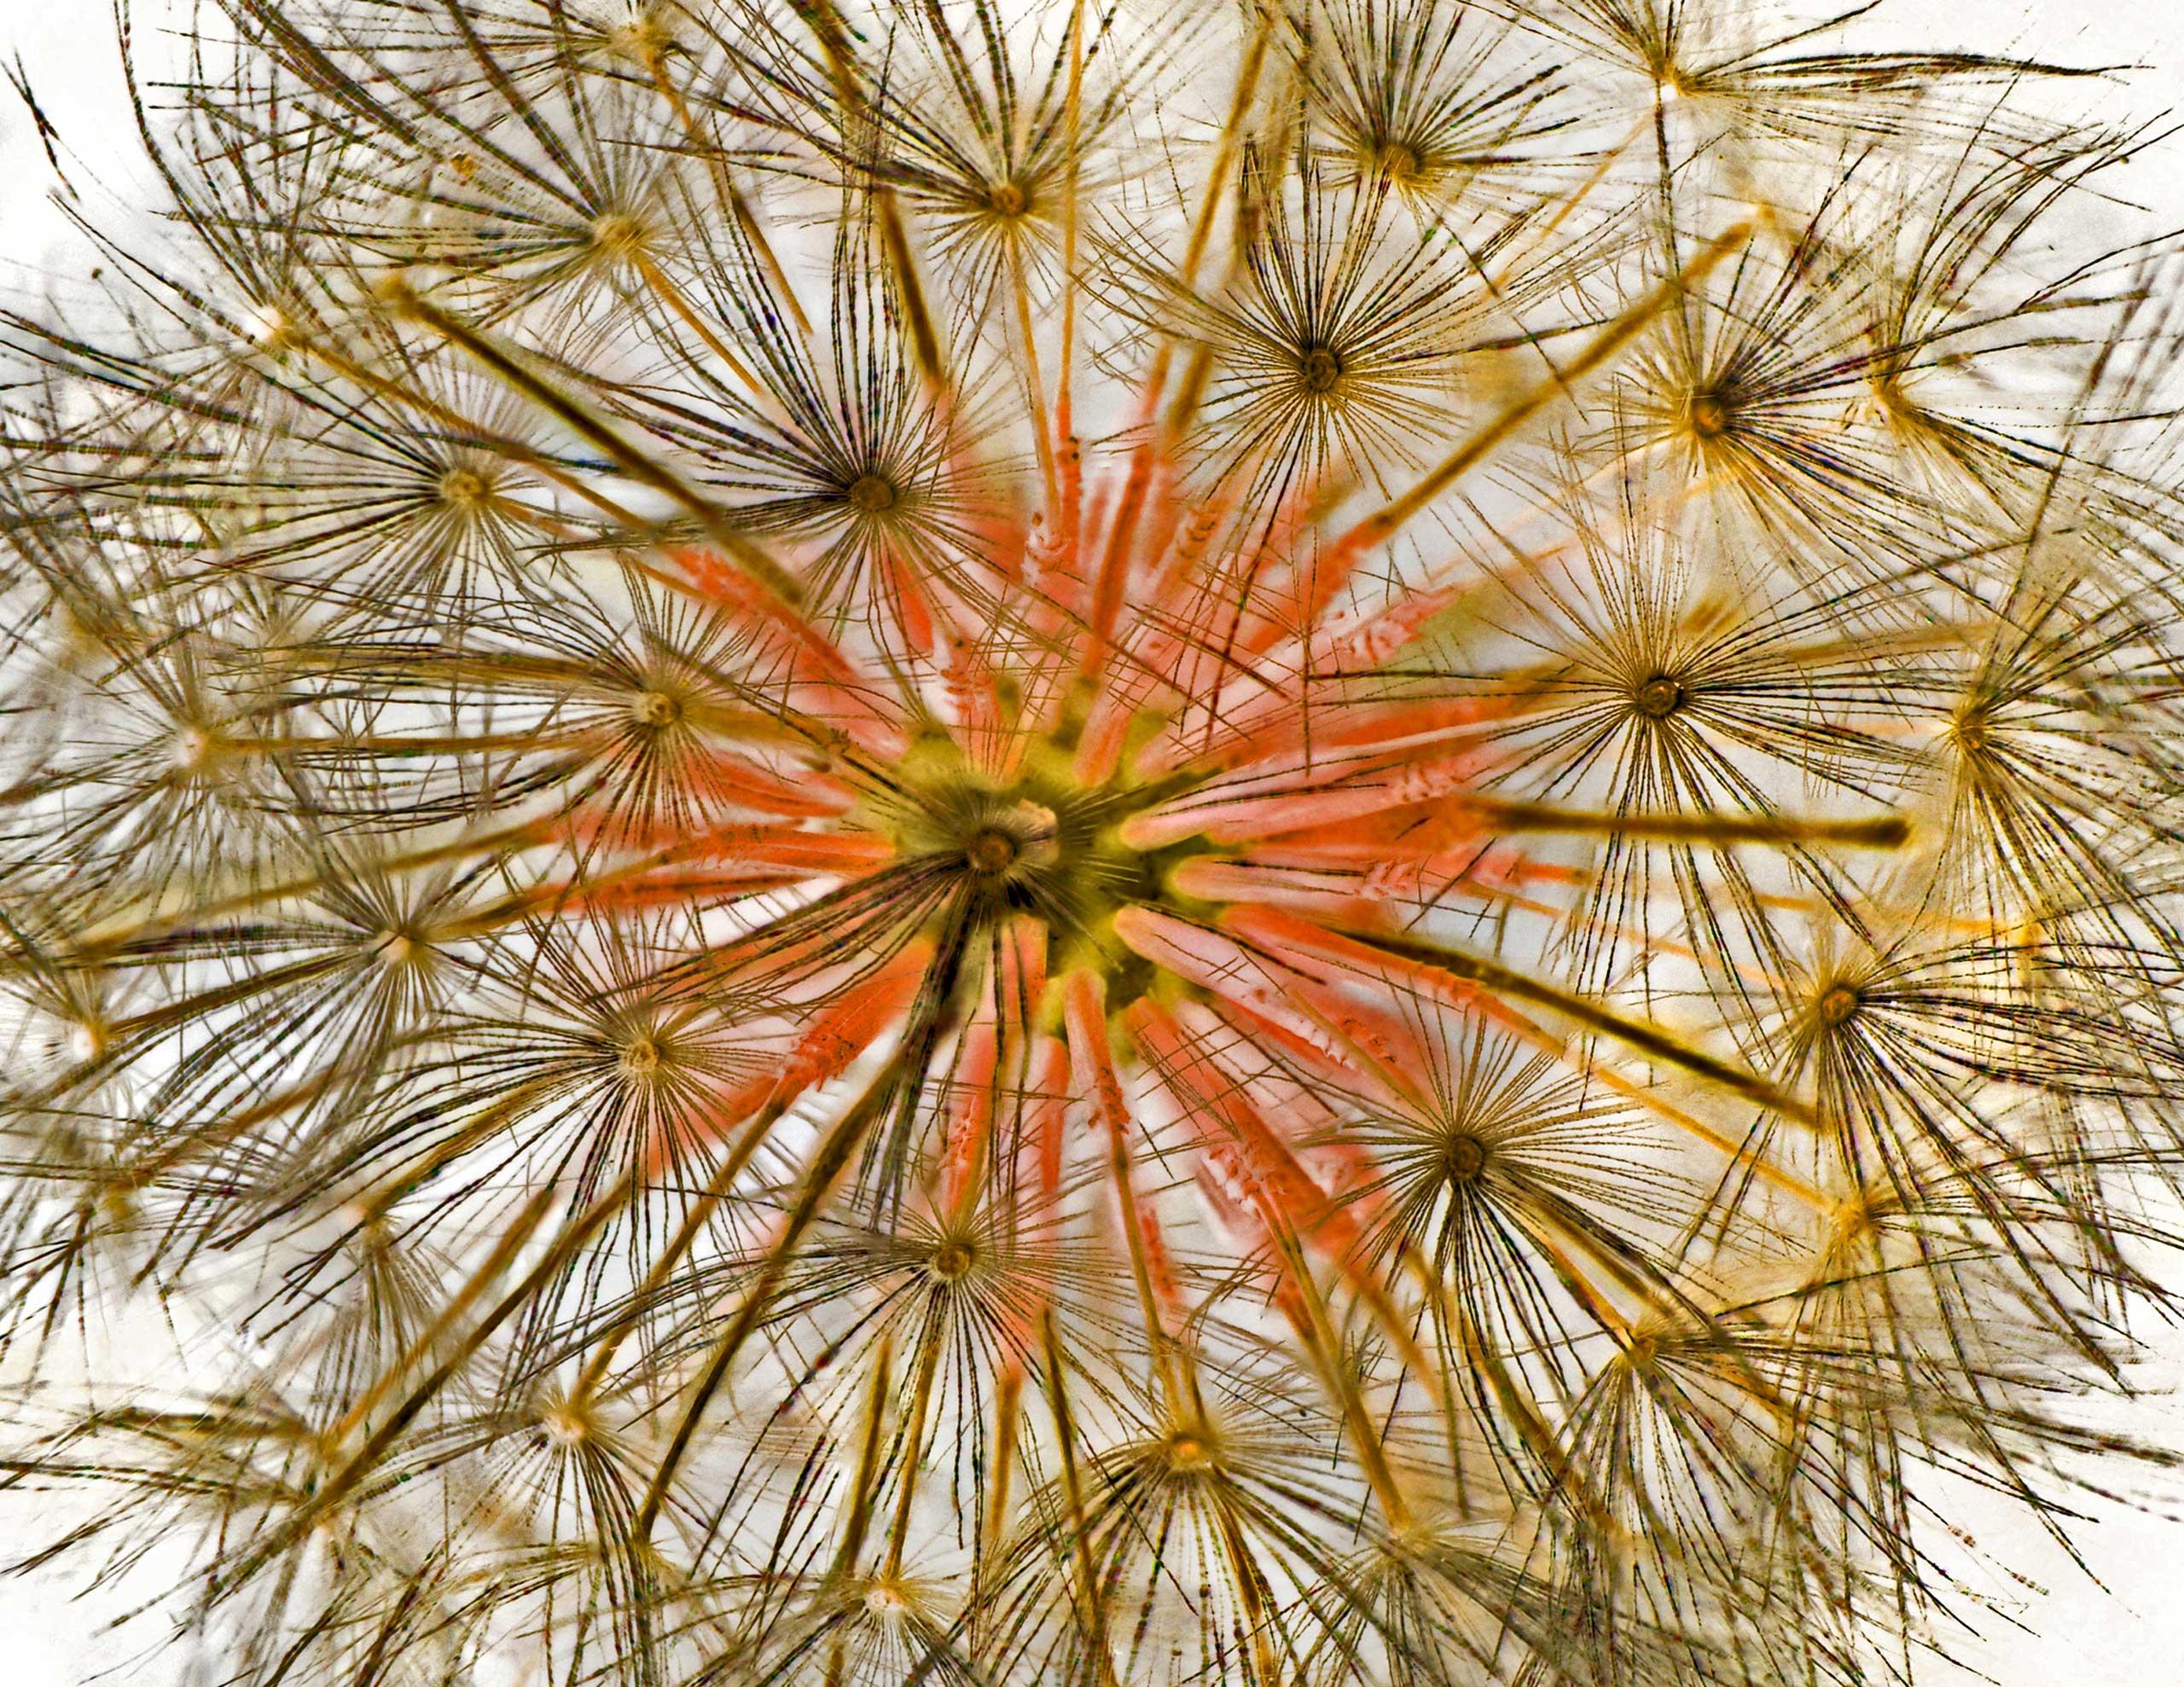 A dandelion at 10x magnification.